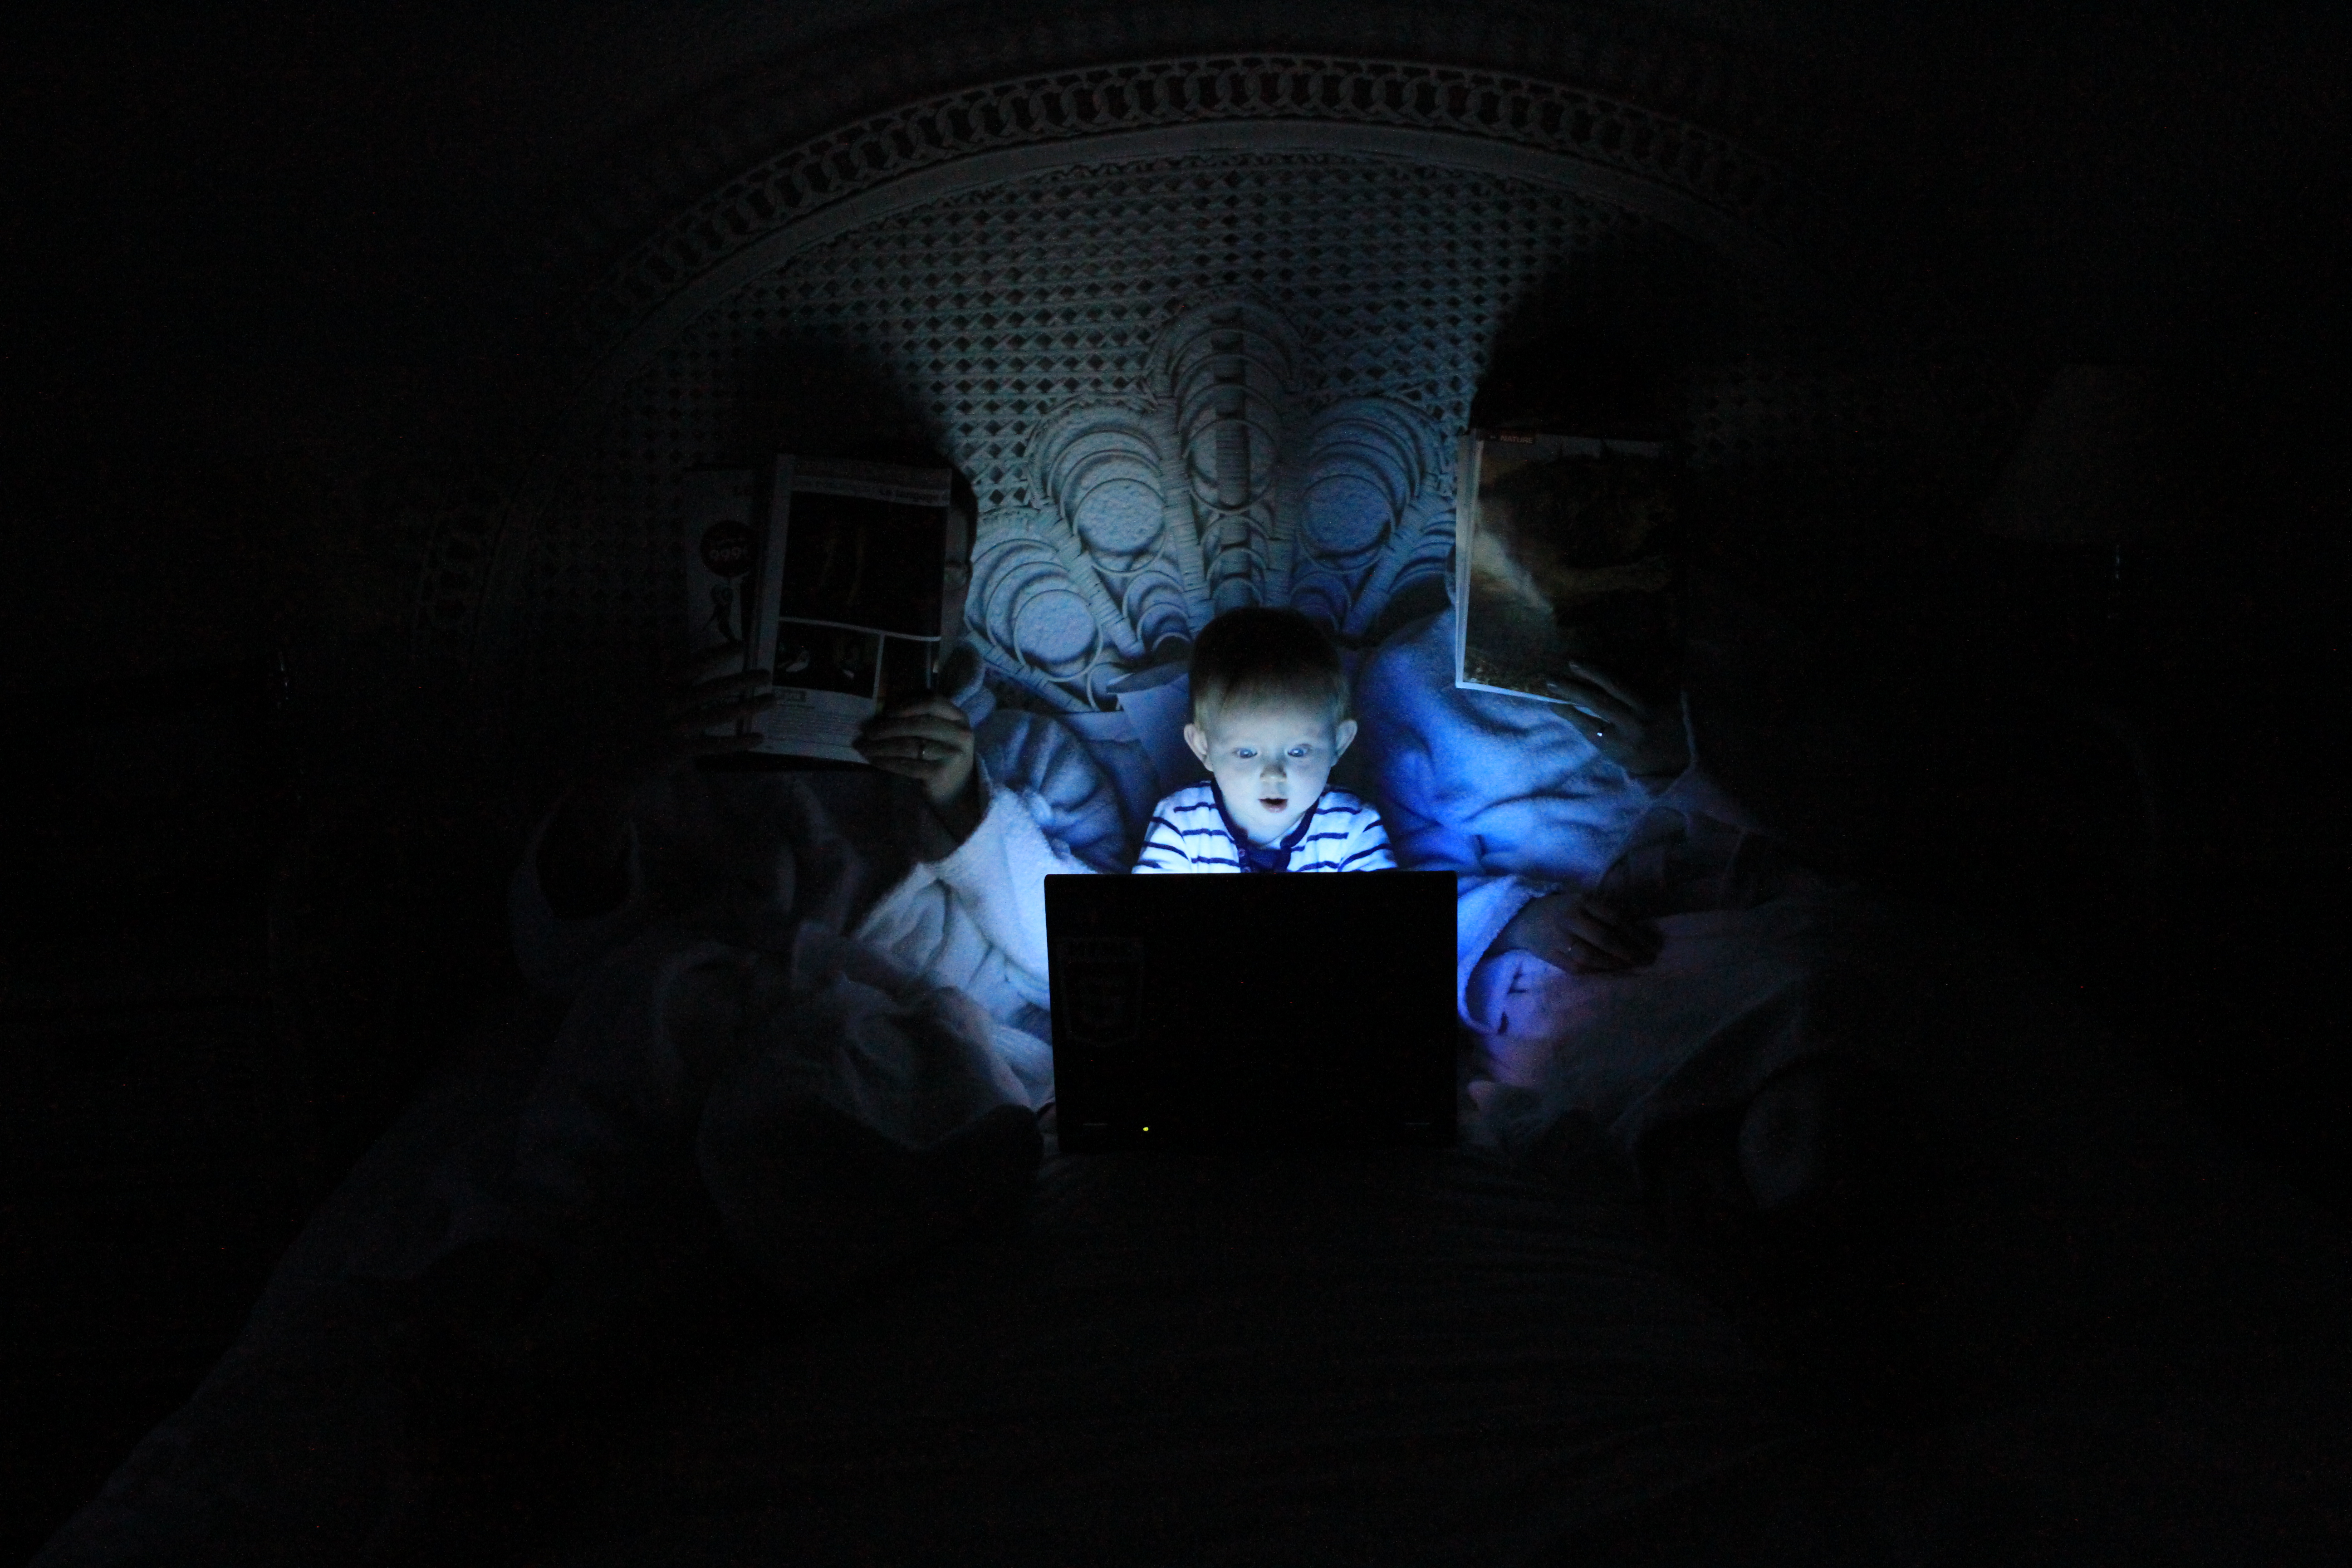 HackTheBox.eu - 3 Month Update